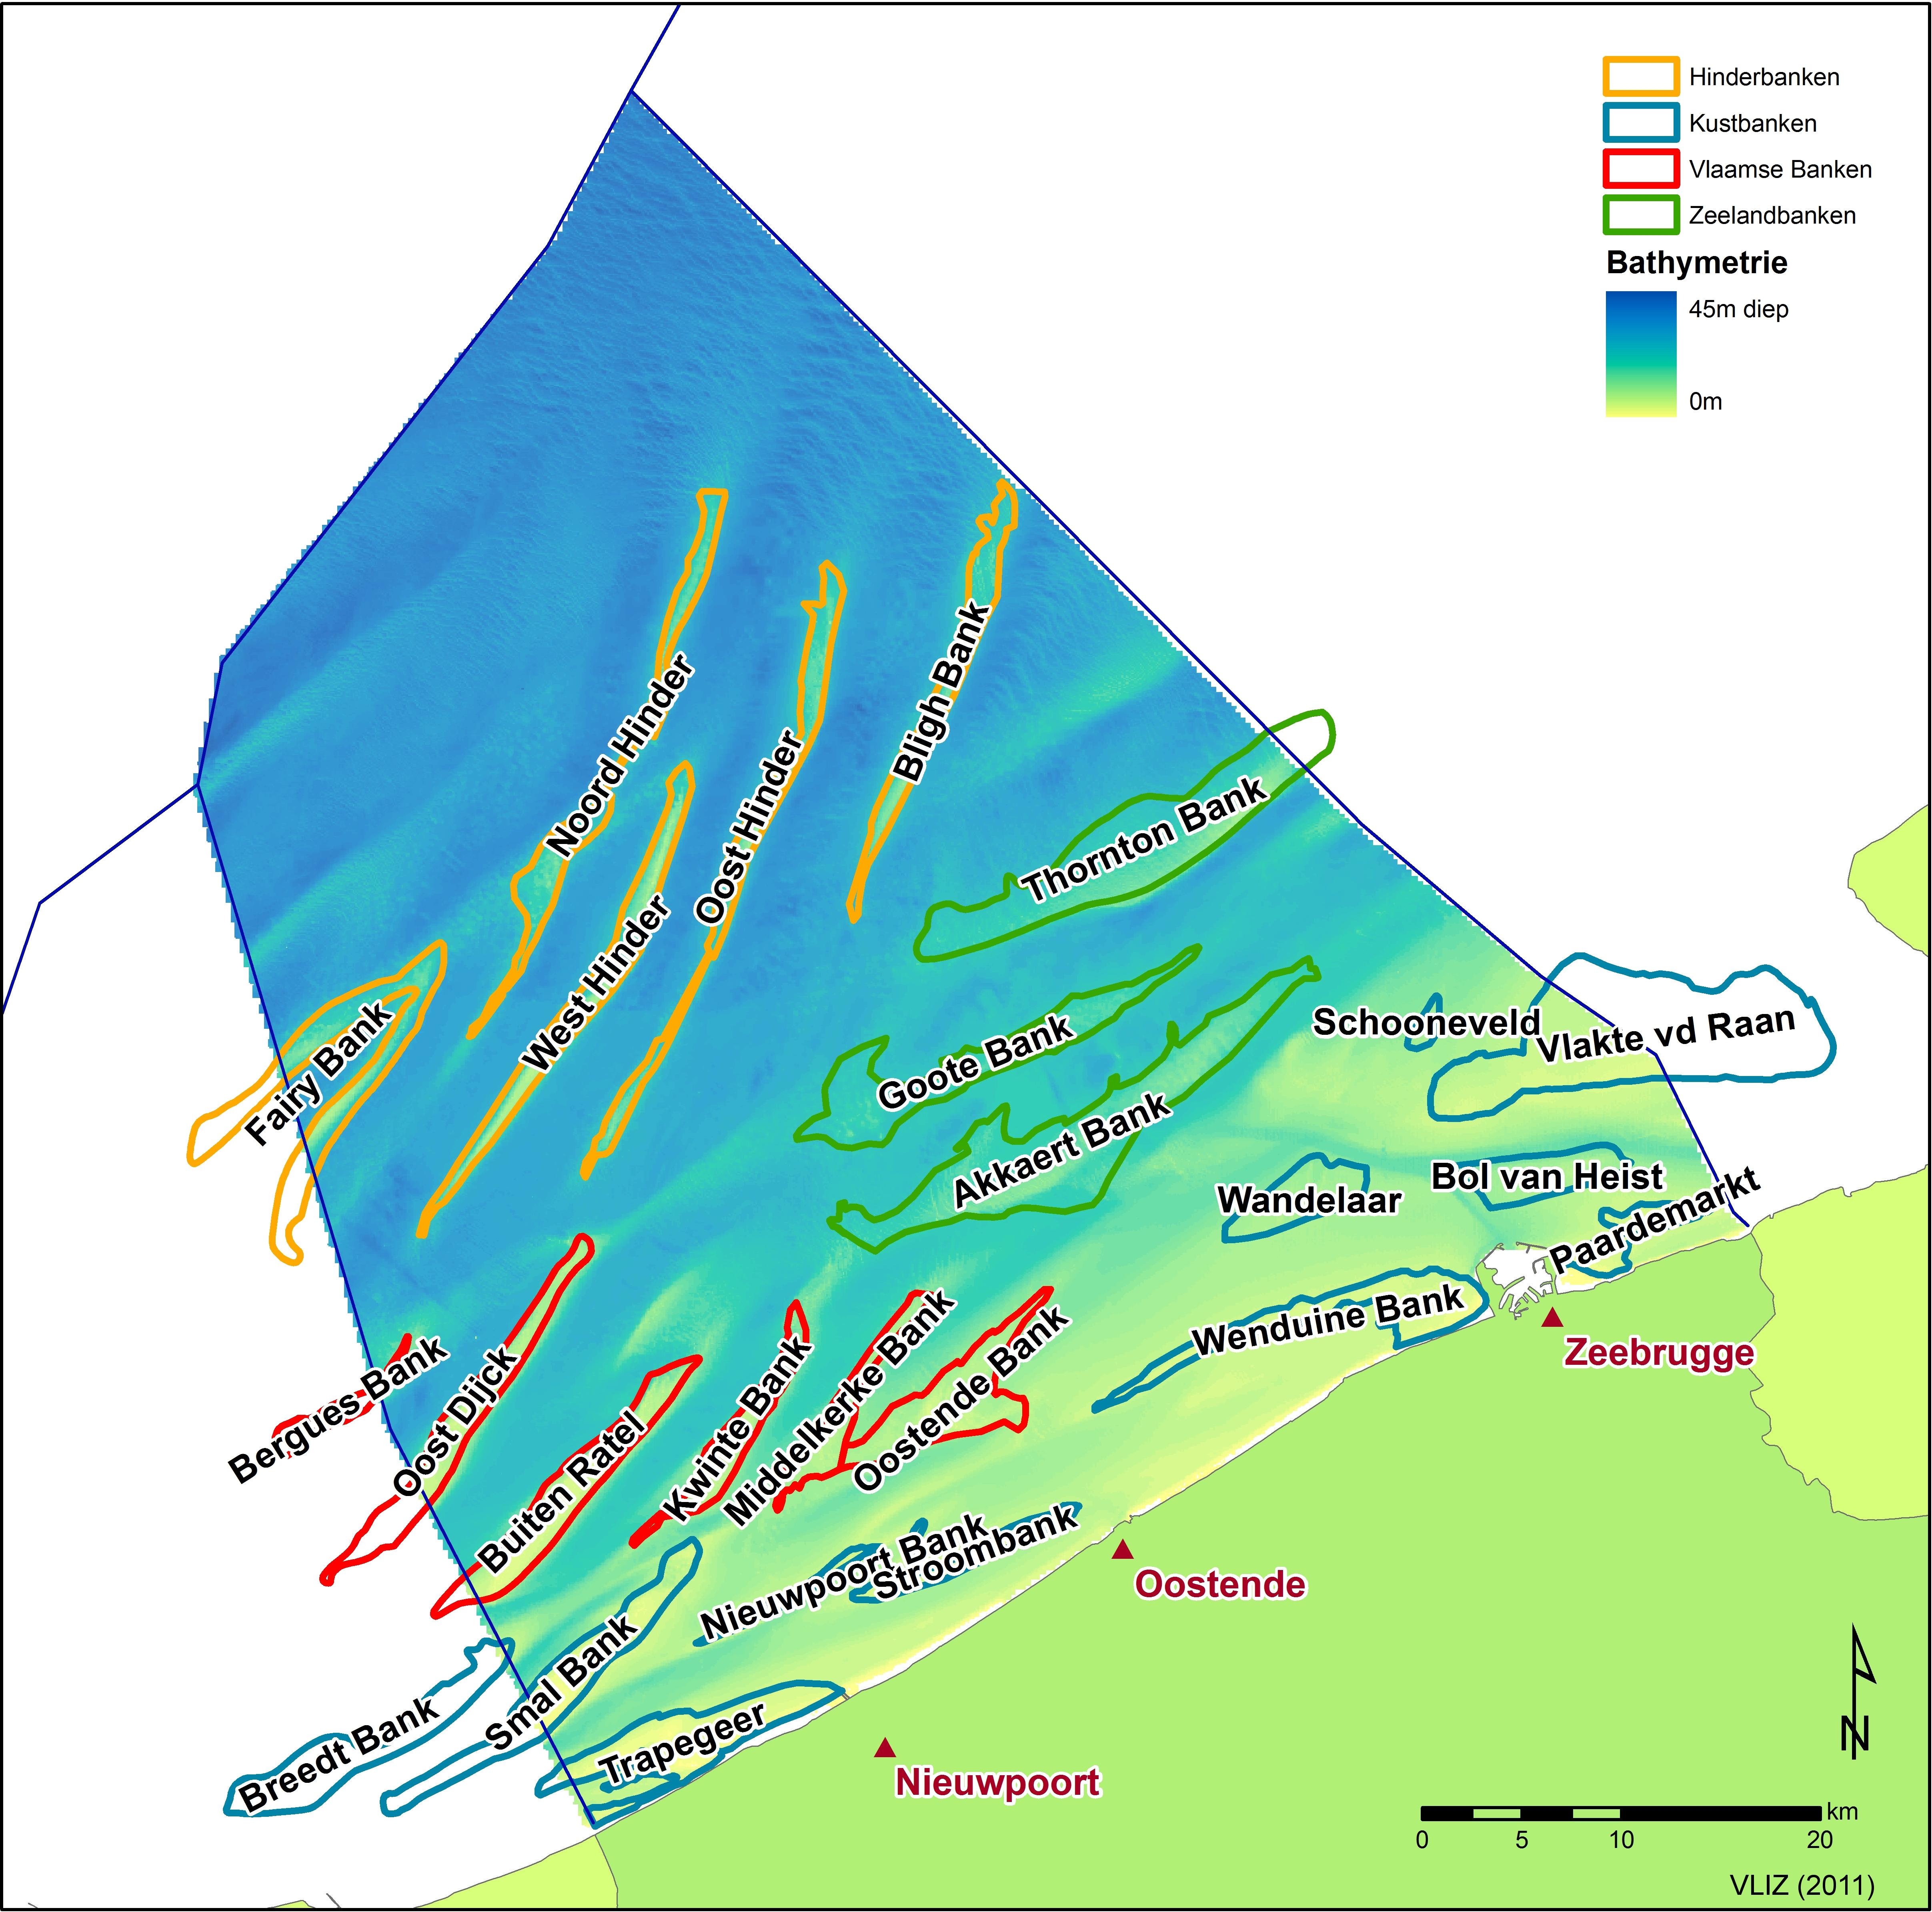 bathymetry of the belgian continental shelf